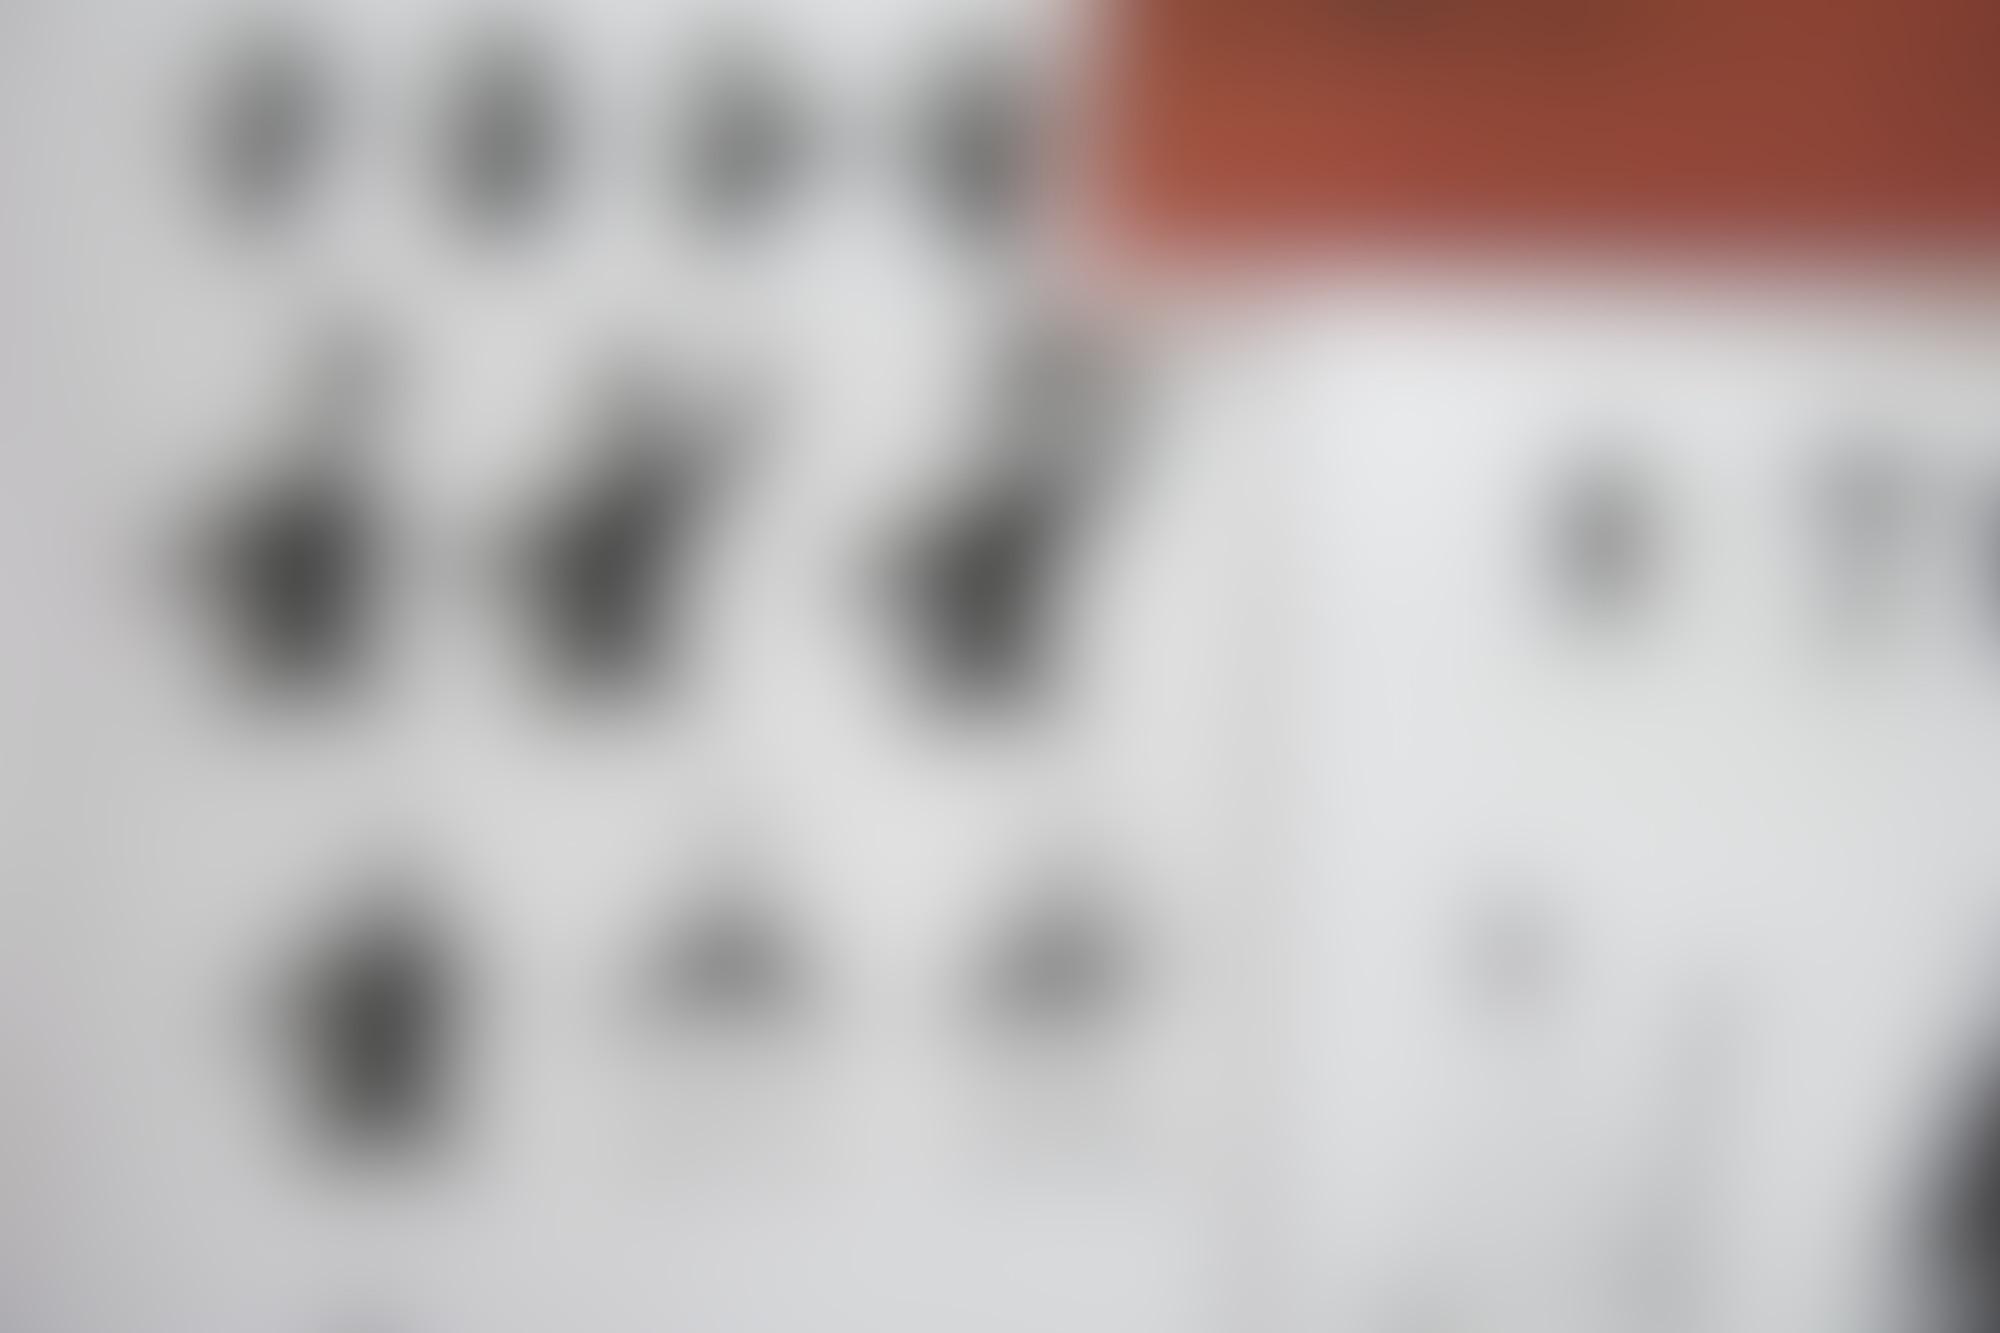 Wall black and white autocompressfitresizeixlibphp 1 1 0max h2000max w3 D2000q80sa4c34e1ea094a7af17337644903bd411